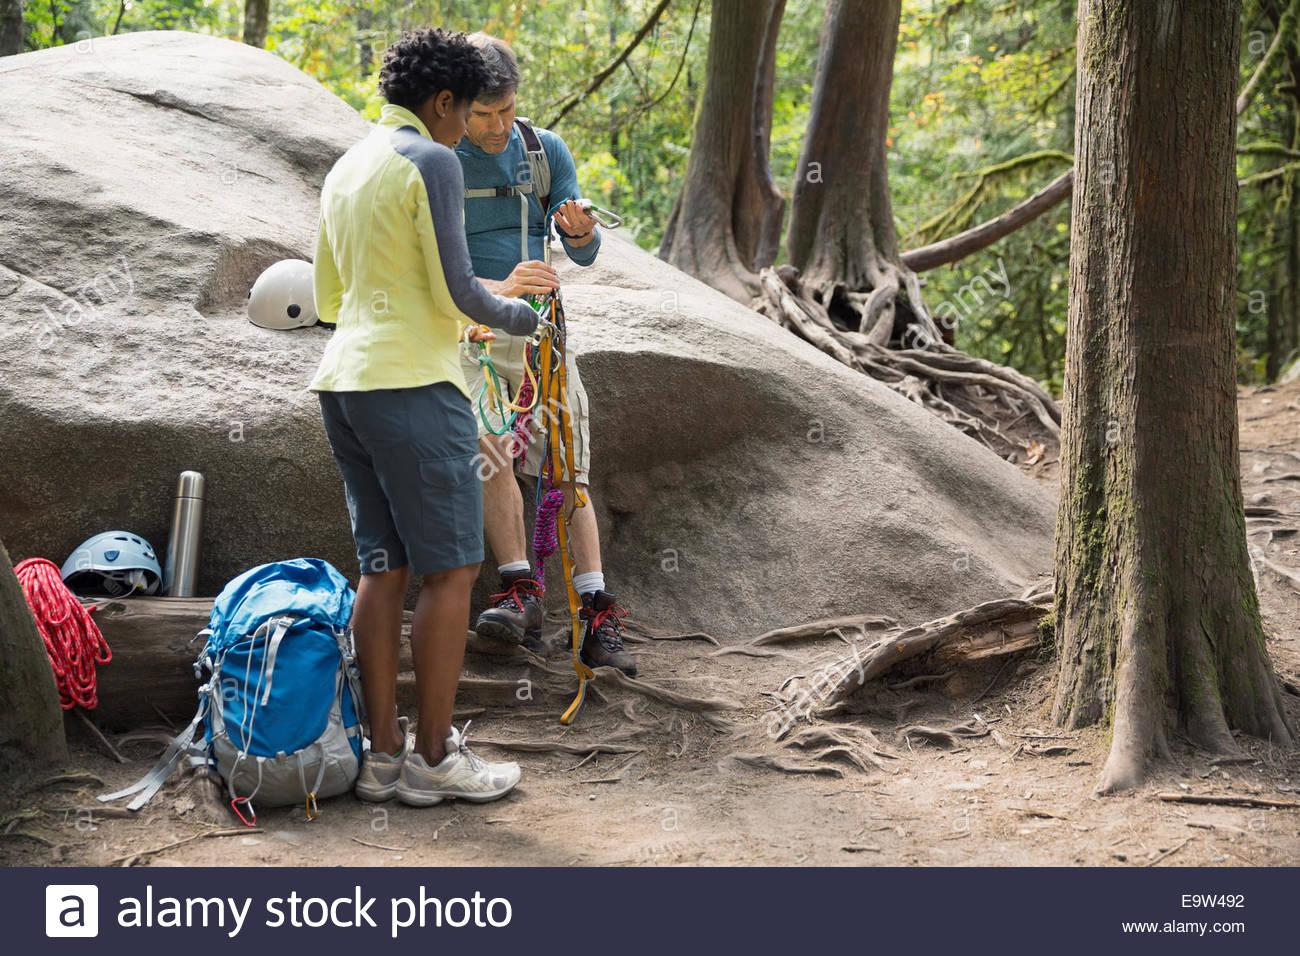 Couple organizing rock climbing equipment in woods - Stock Image